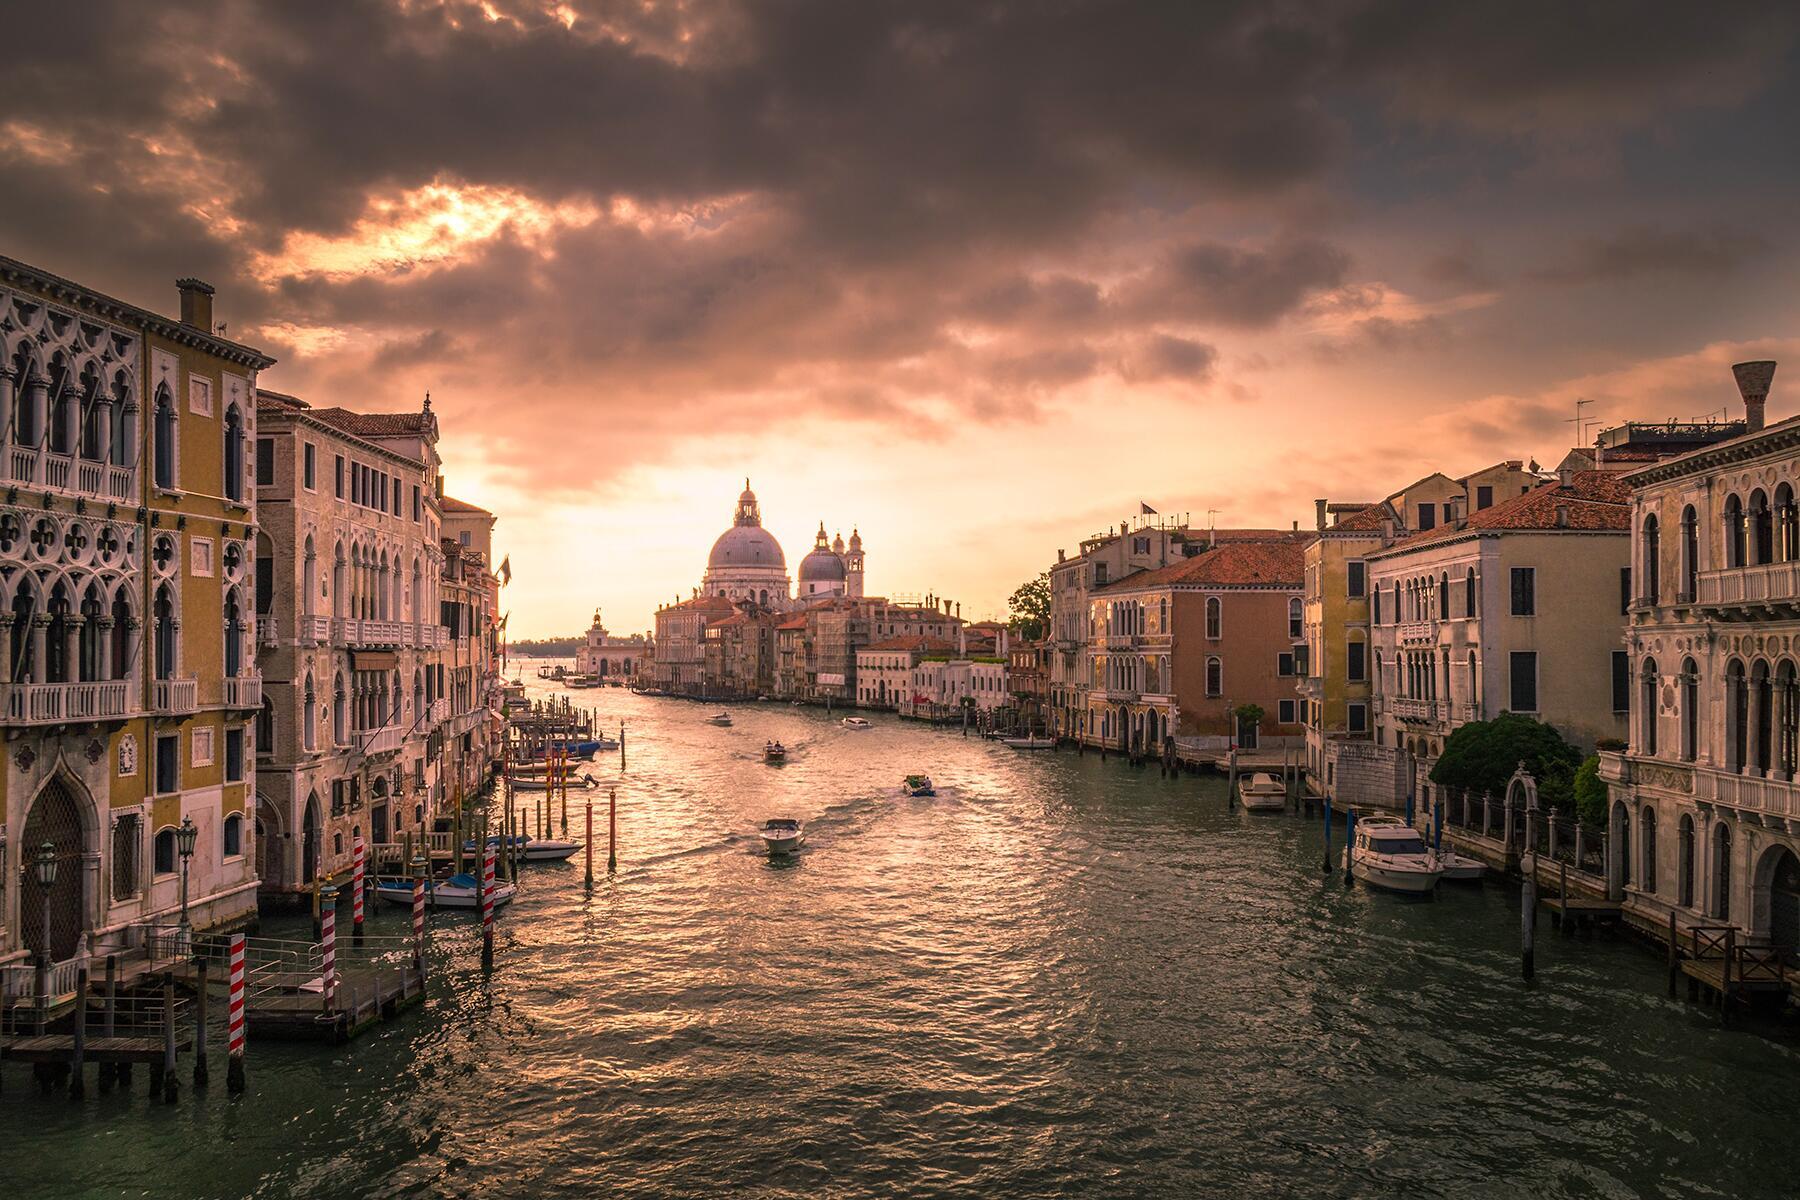 Venice cover image